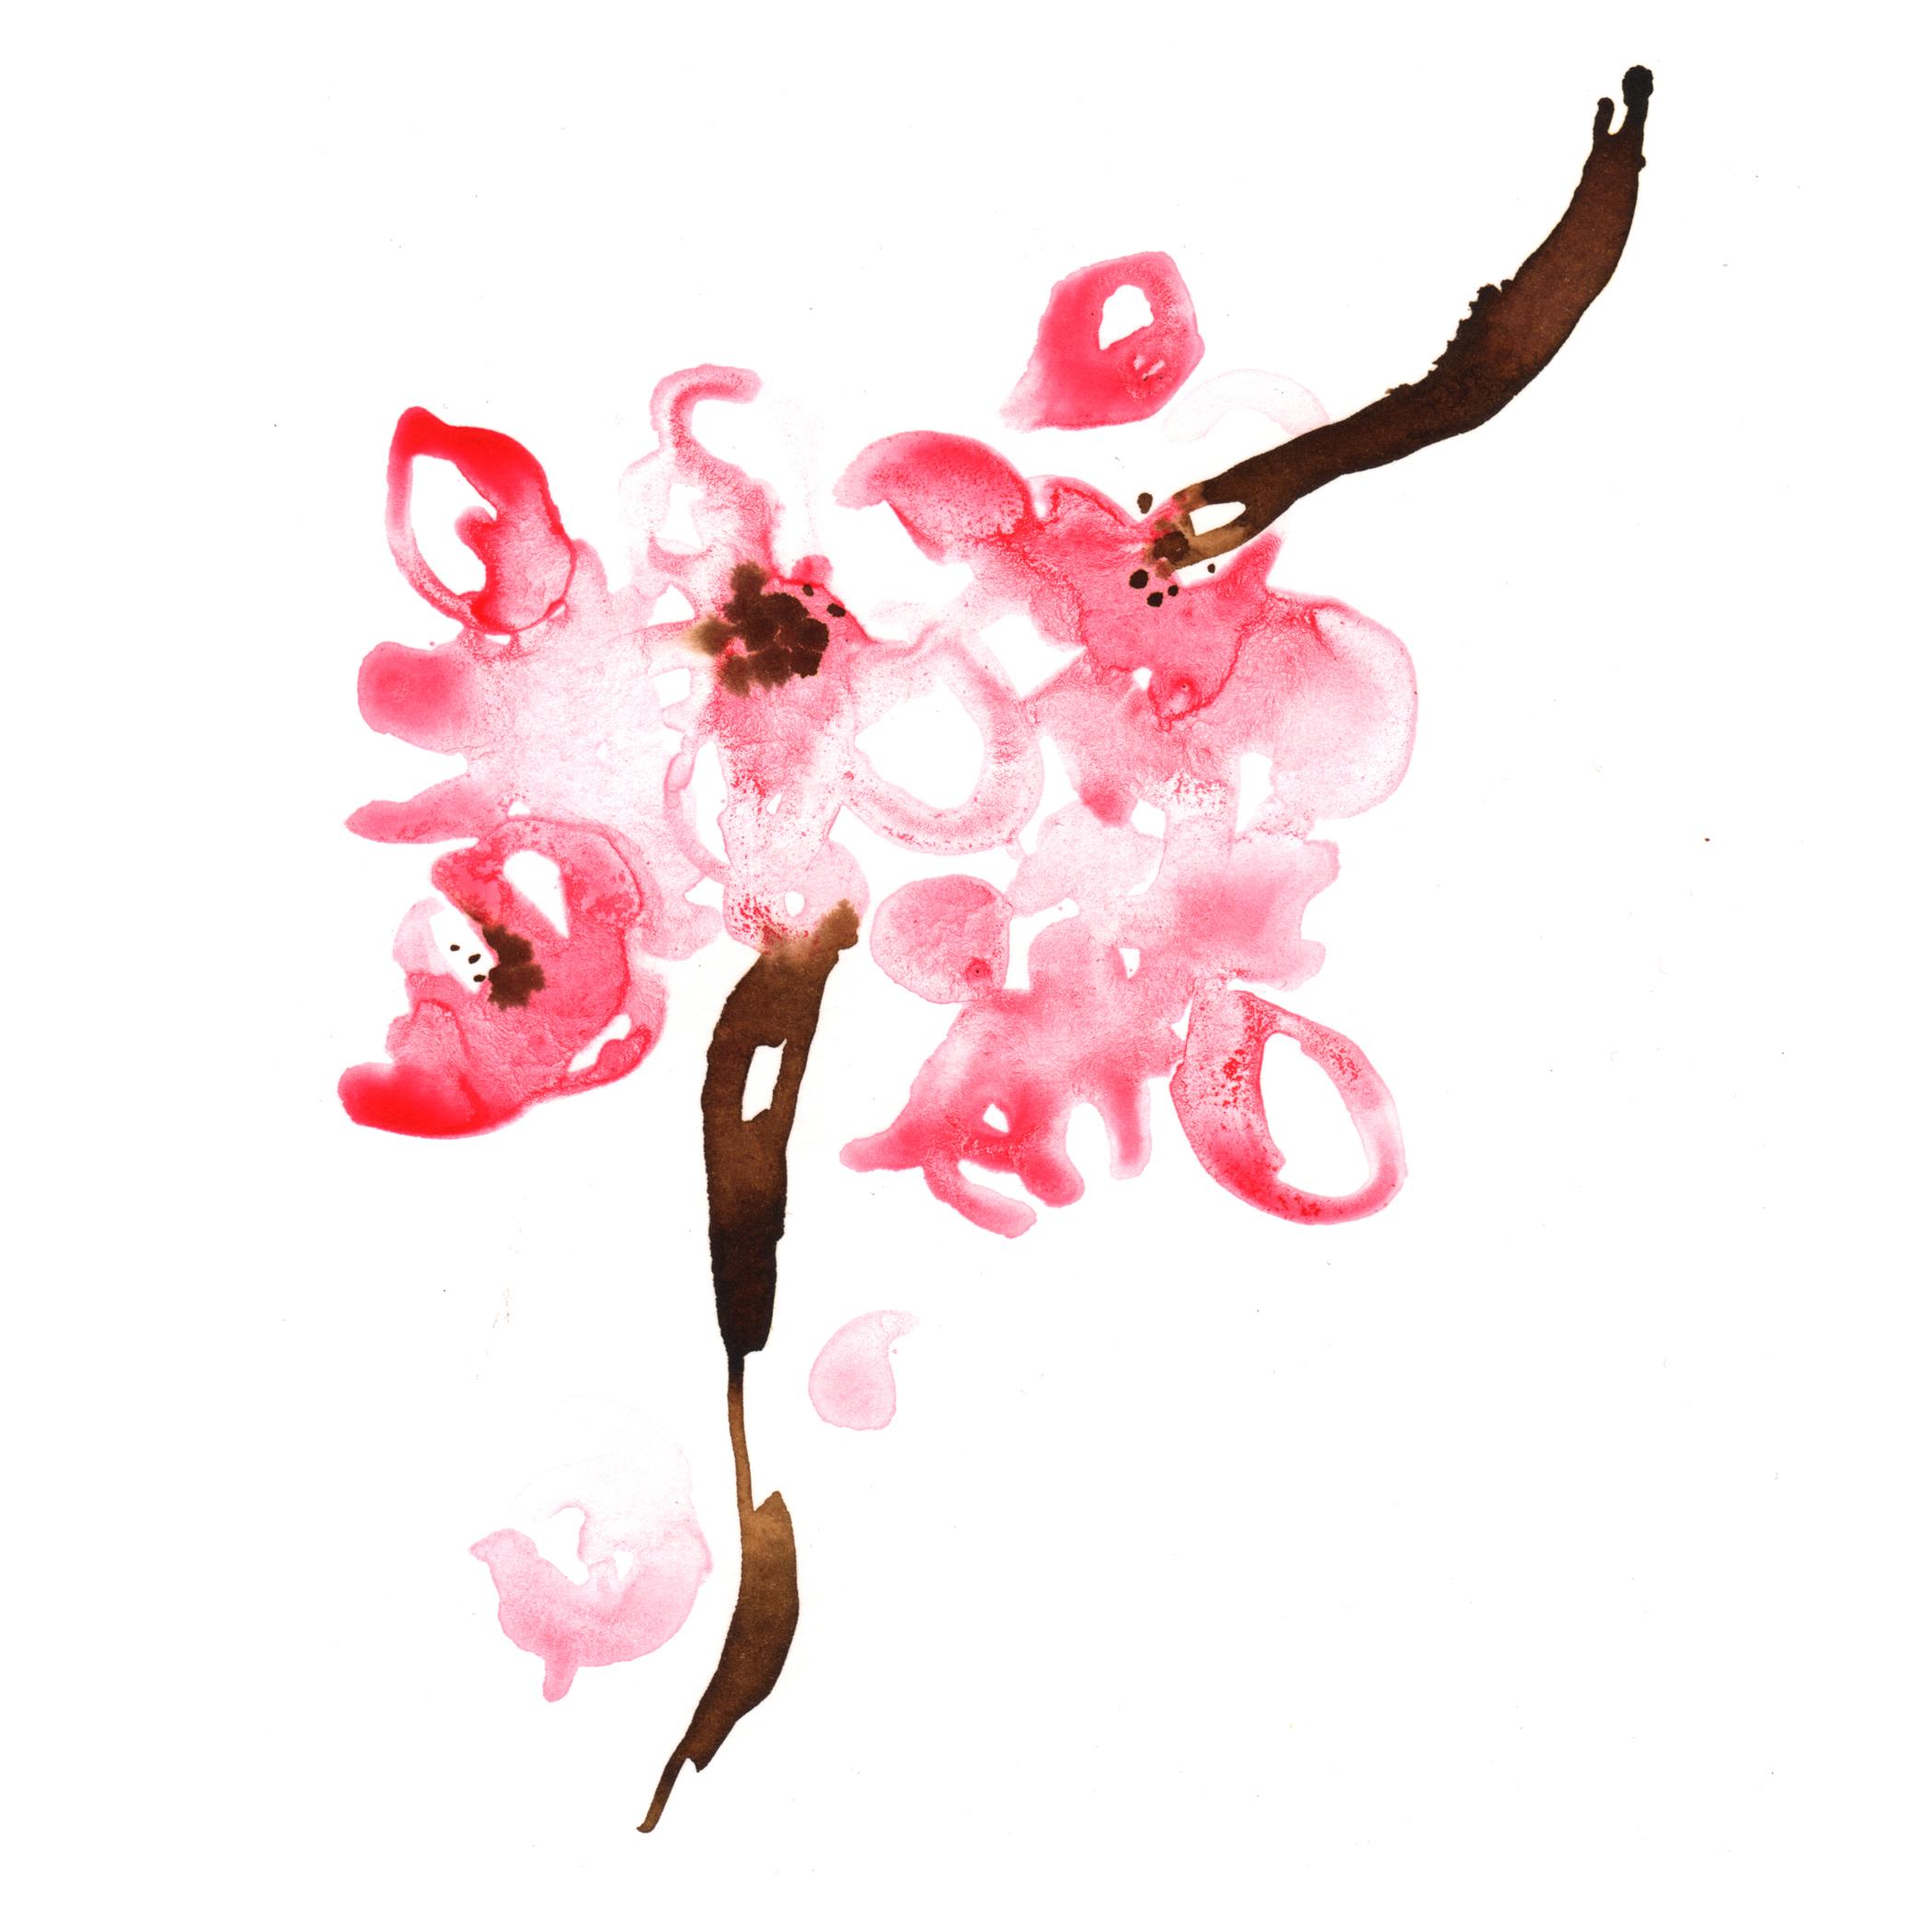 71.Cherry.Blossomes.4.20.14.jpg